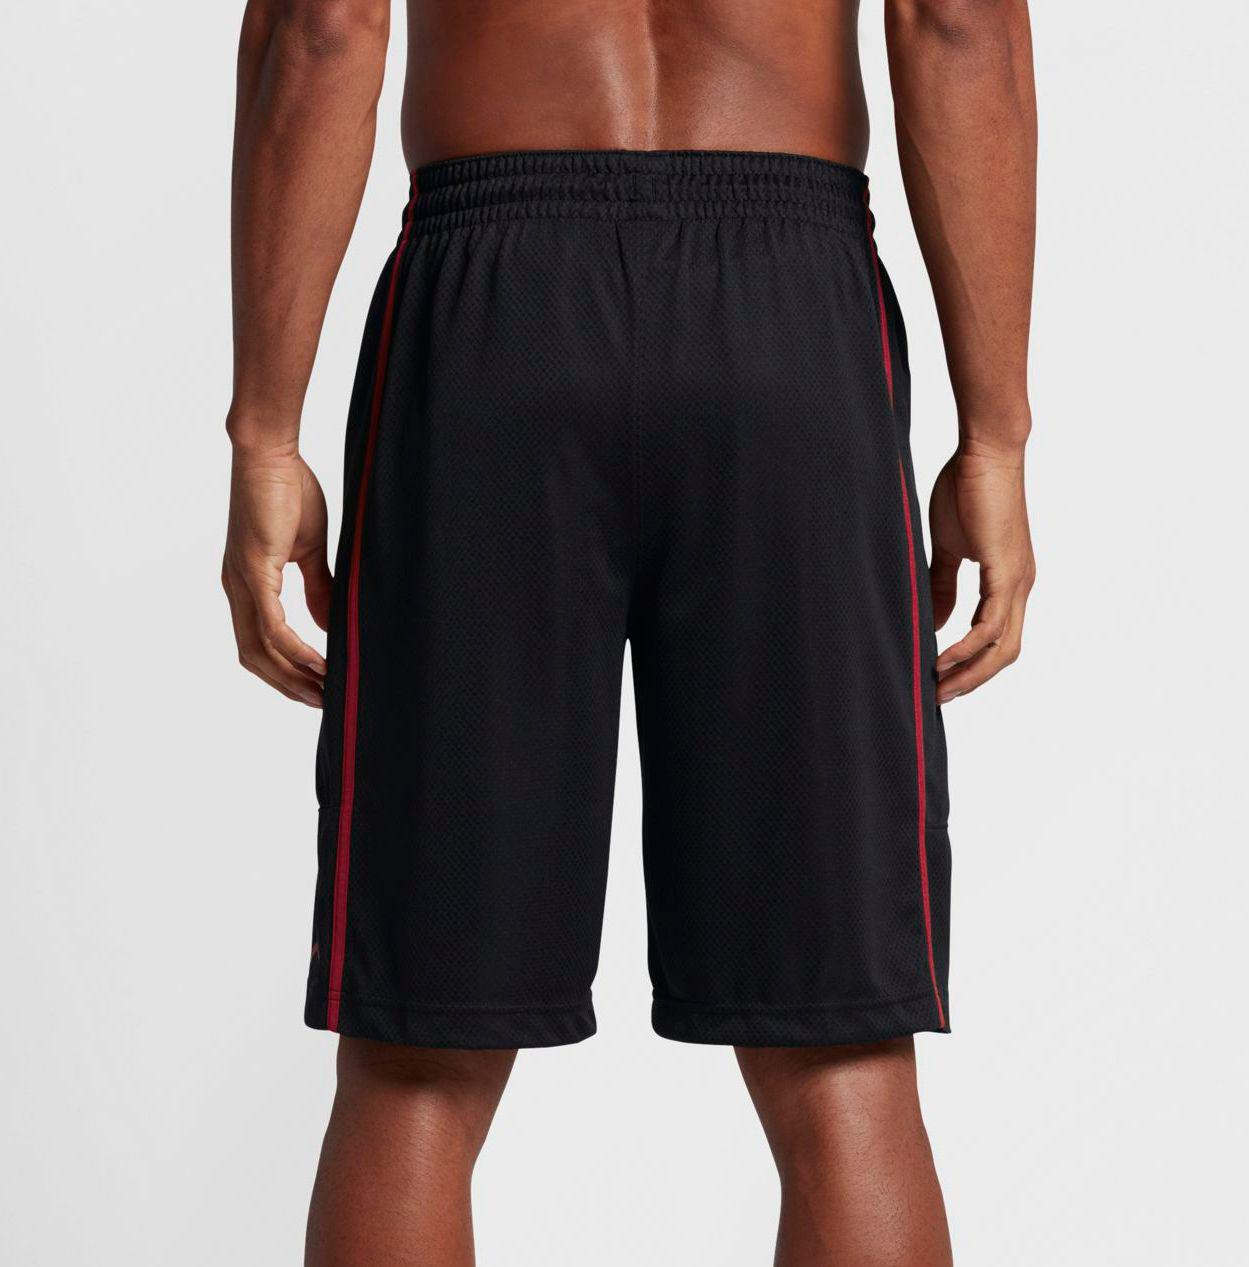 b5a443f6f25b Lyst - Nike Jordan Double Crossover Basketball Shorts in Black for Men